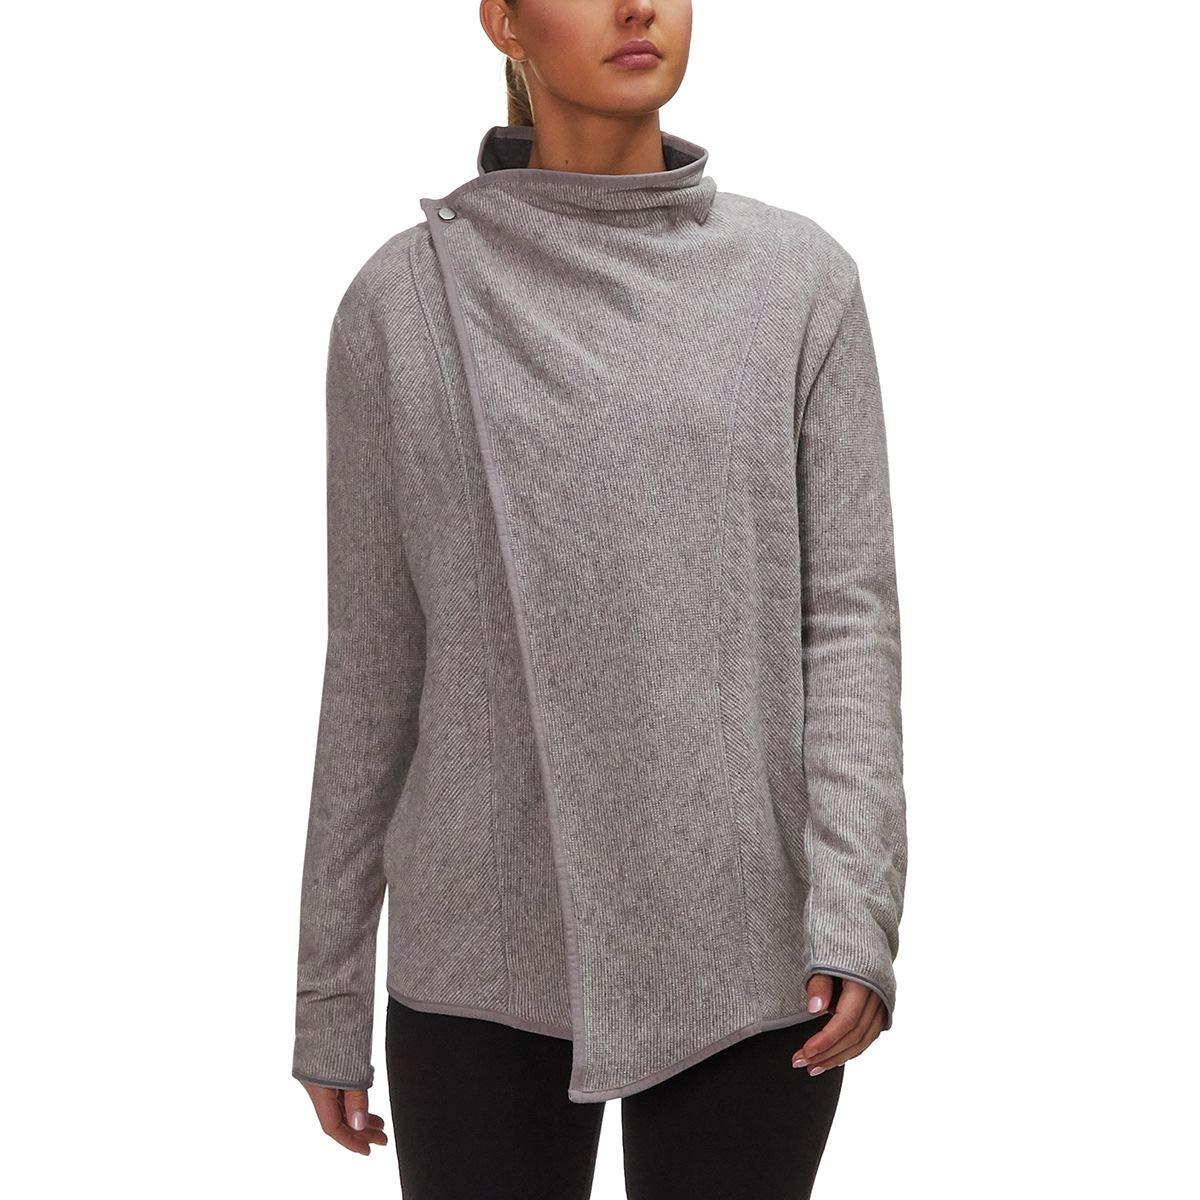 32b64736c2 Mountain Hardwear 1733021 Women s Sarafin Wrap Sweater at Amazon Women s  Clothing store